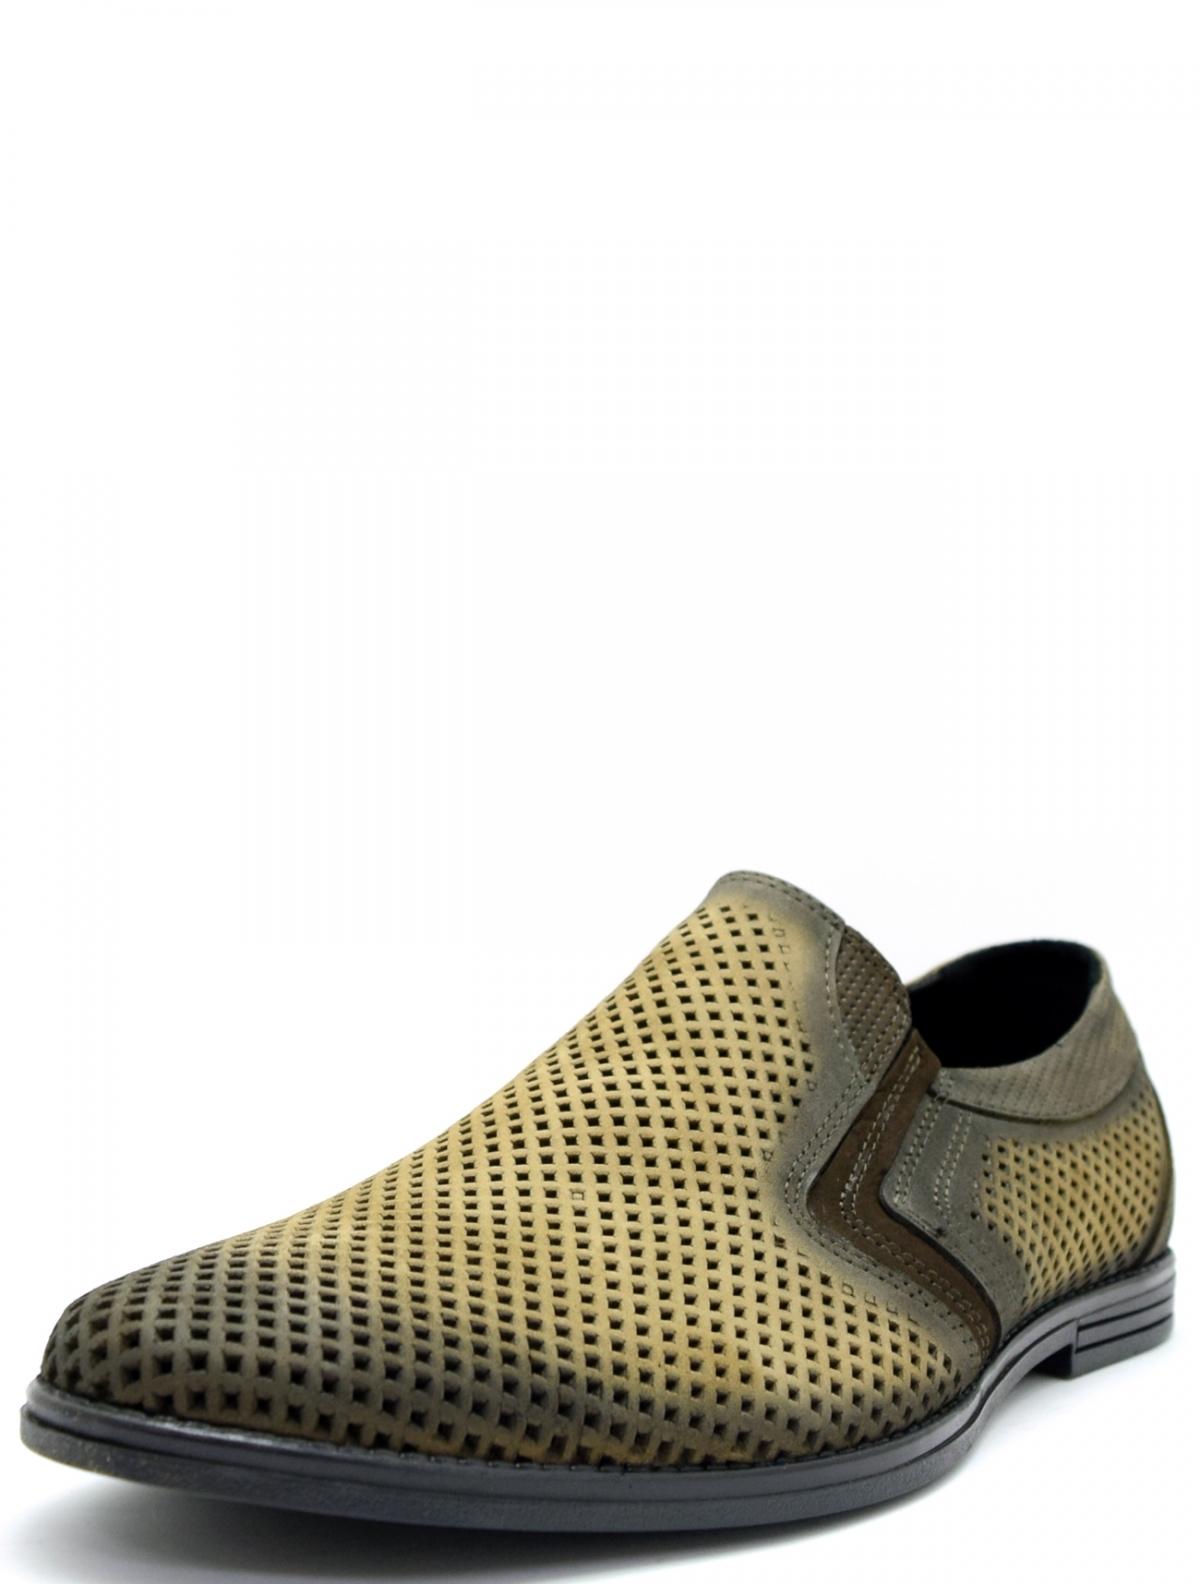 Rooman 905-243-N4N2 мужские туфли